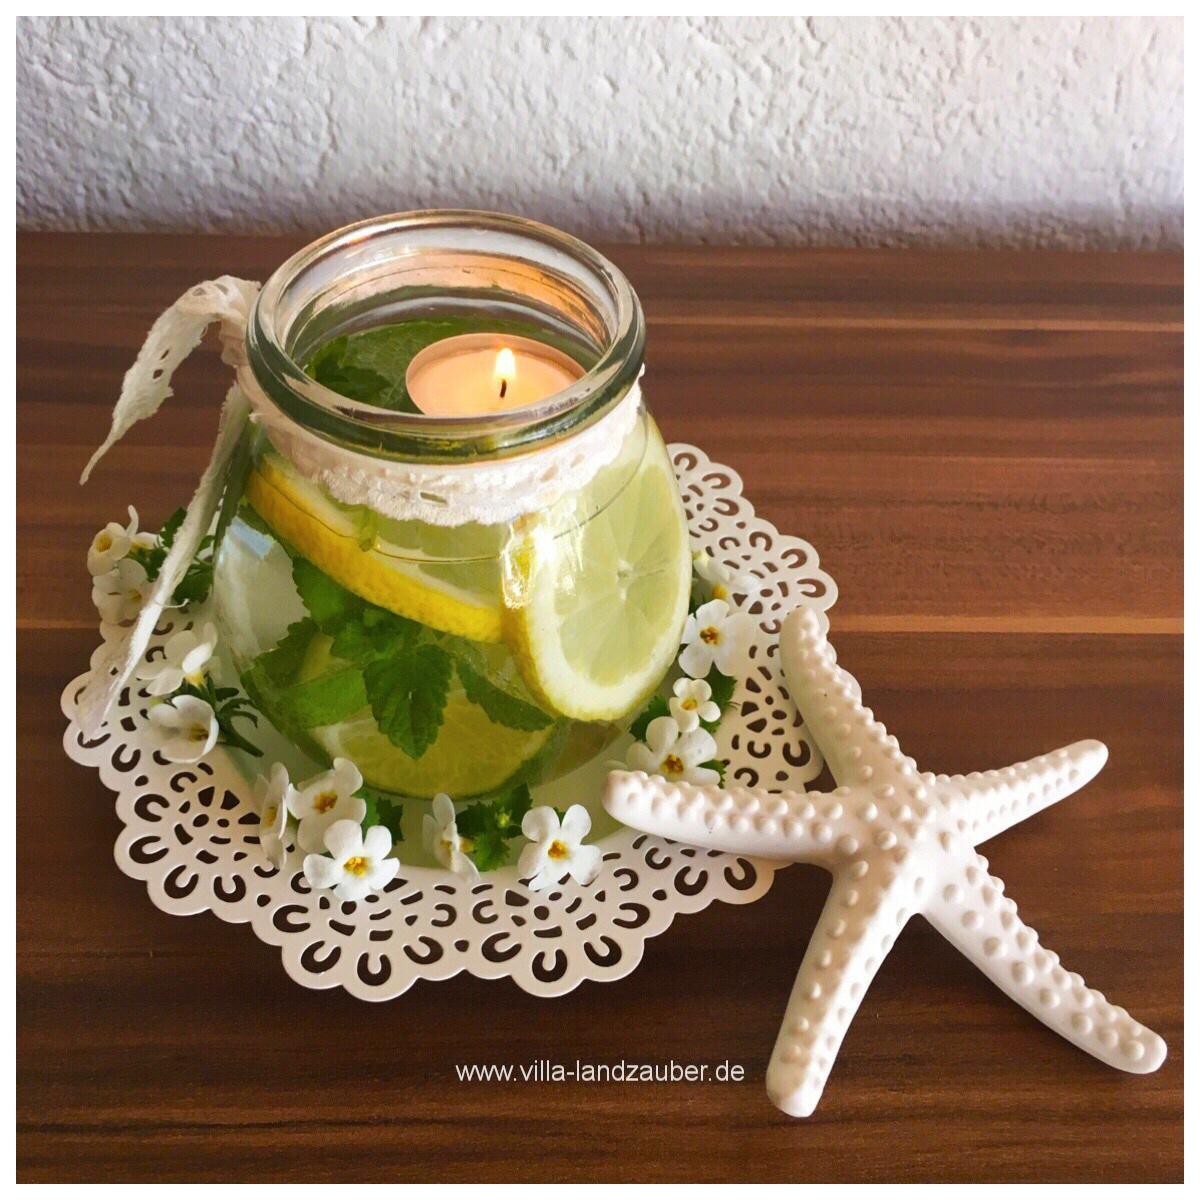 Sommerliche zitronendeko villa landzauber - Marmeladenglas deko ...